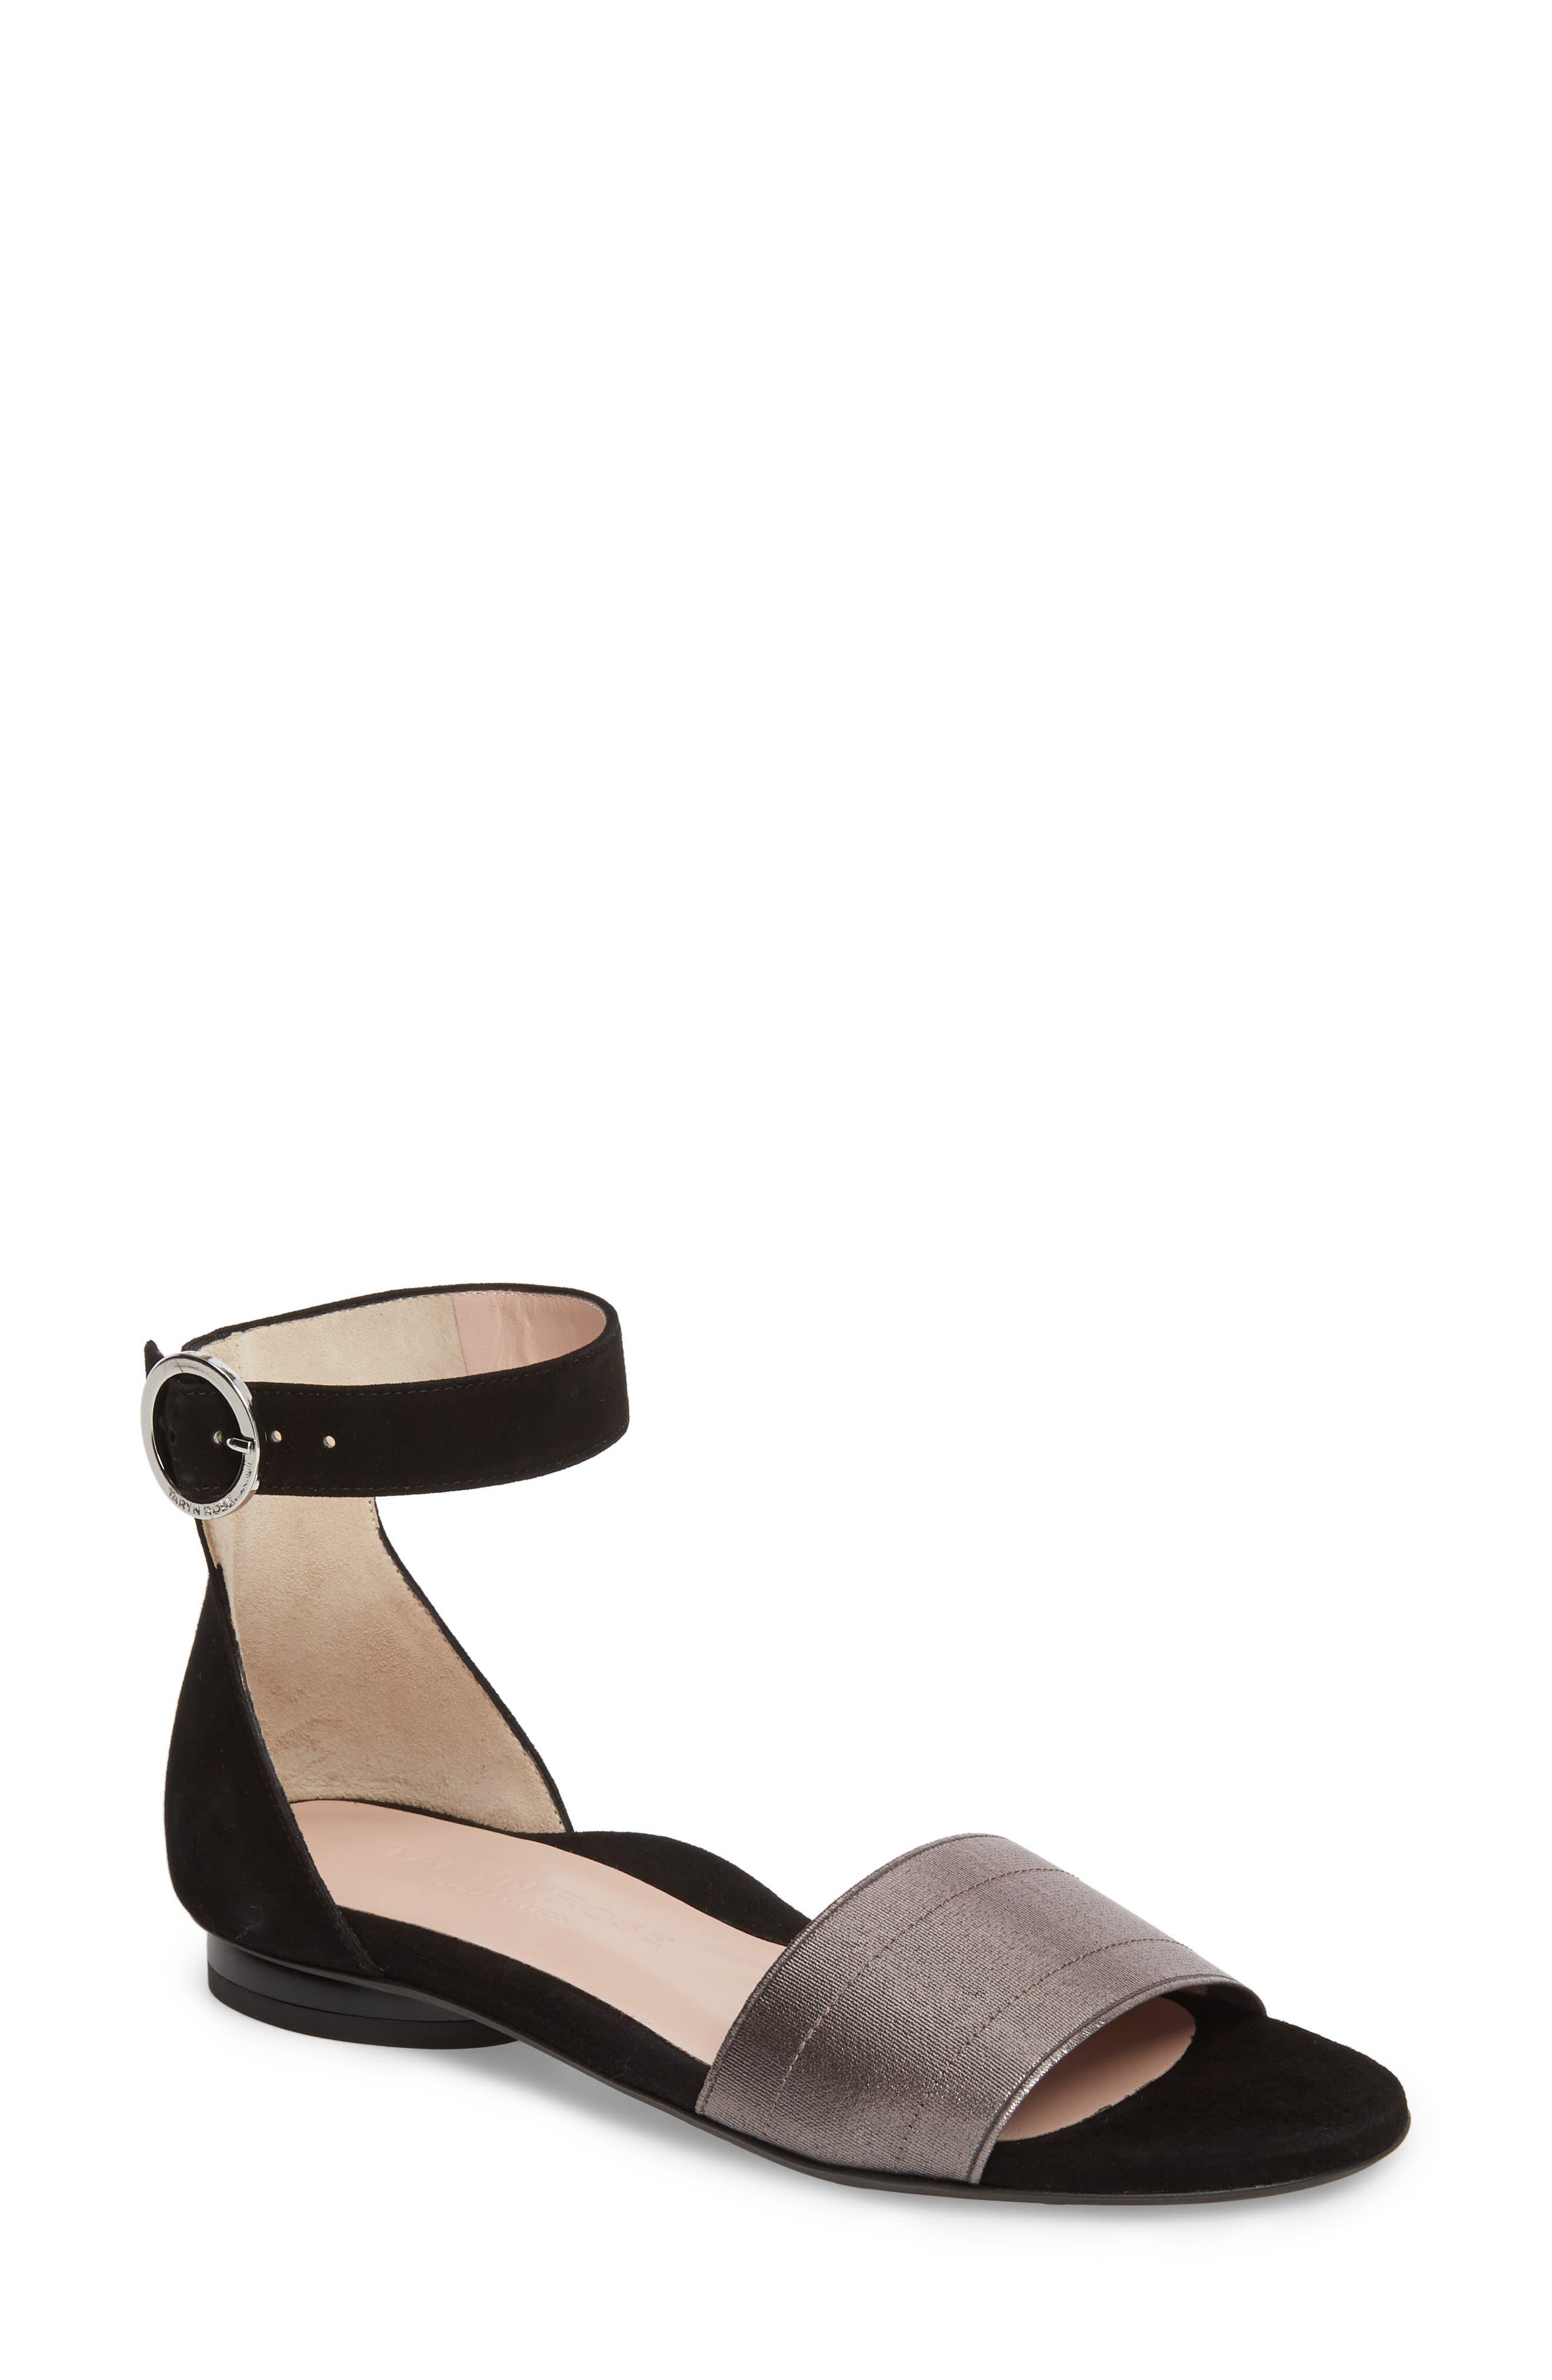 Donati Ankle Strap Sandal,                         Main,                         color, Black/ Gunmetal Suede